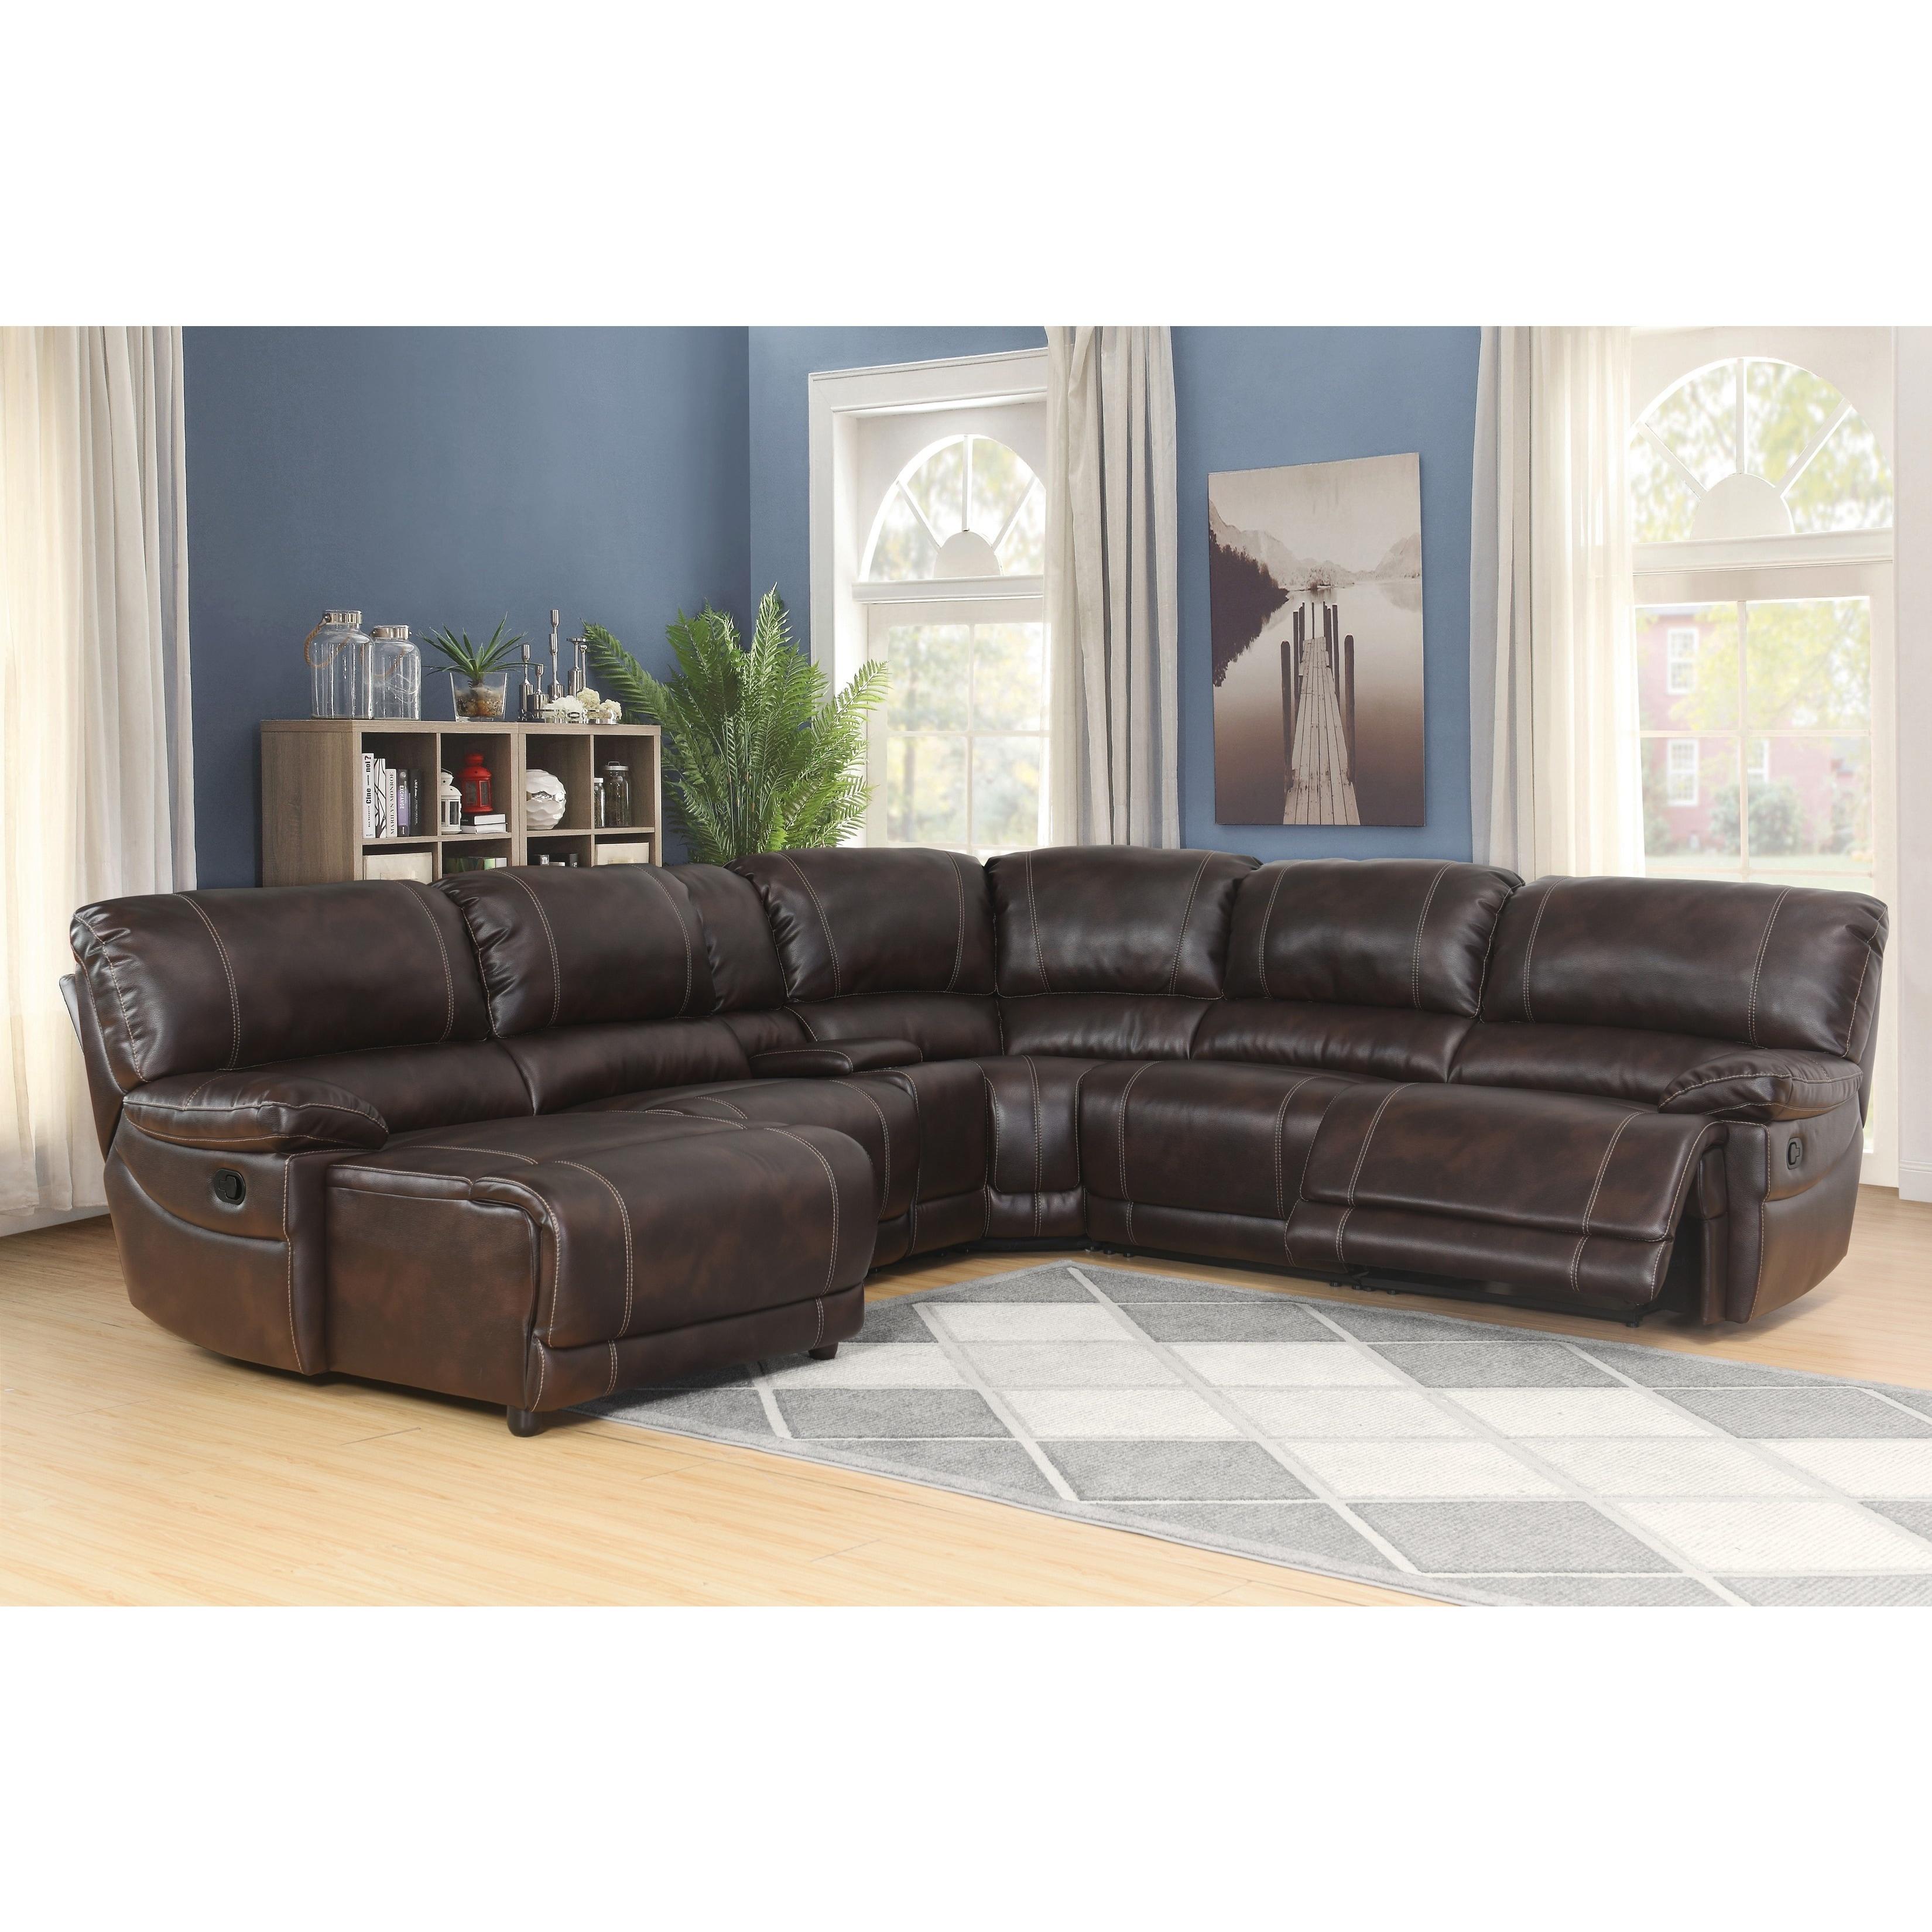 Dark sectional sofa wwwenergywardennet for 6 piece microfiber sectional sofa